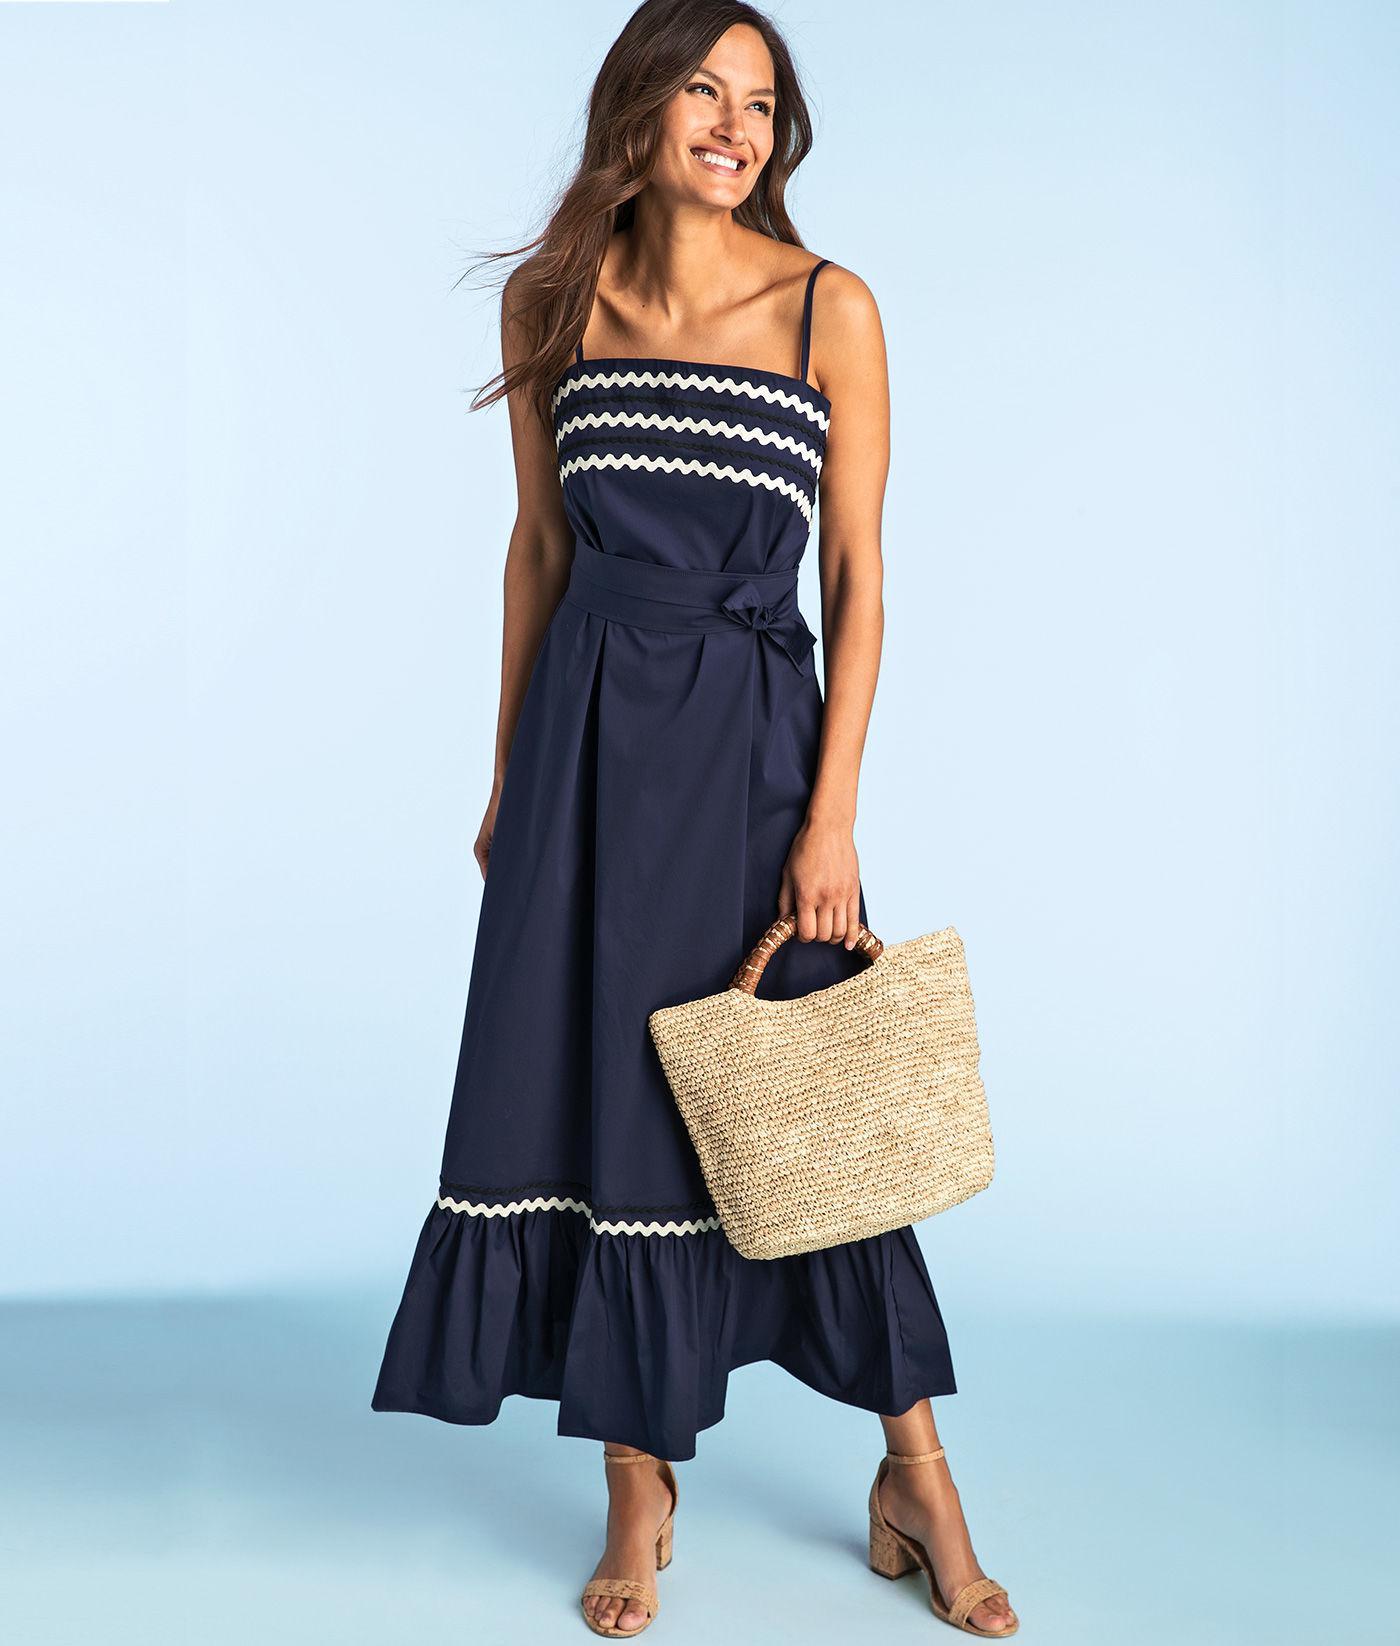 076b279de8 Vineyard Vines Ric Rac Maxi Dress in Blue - Lyst